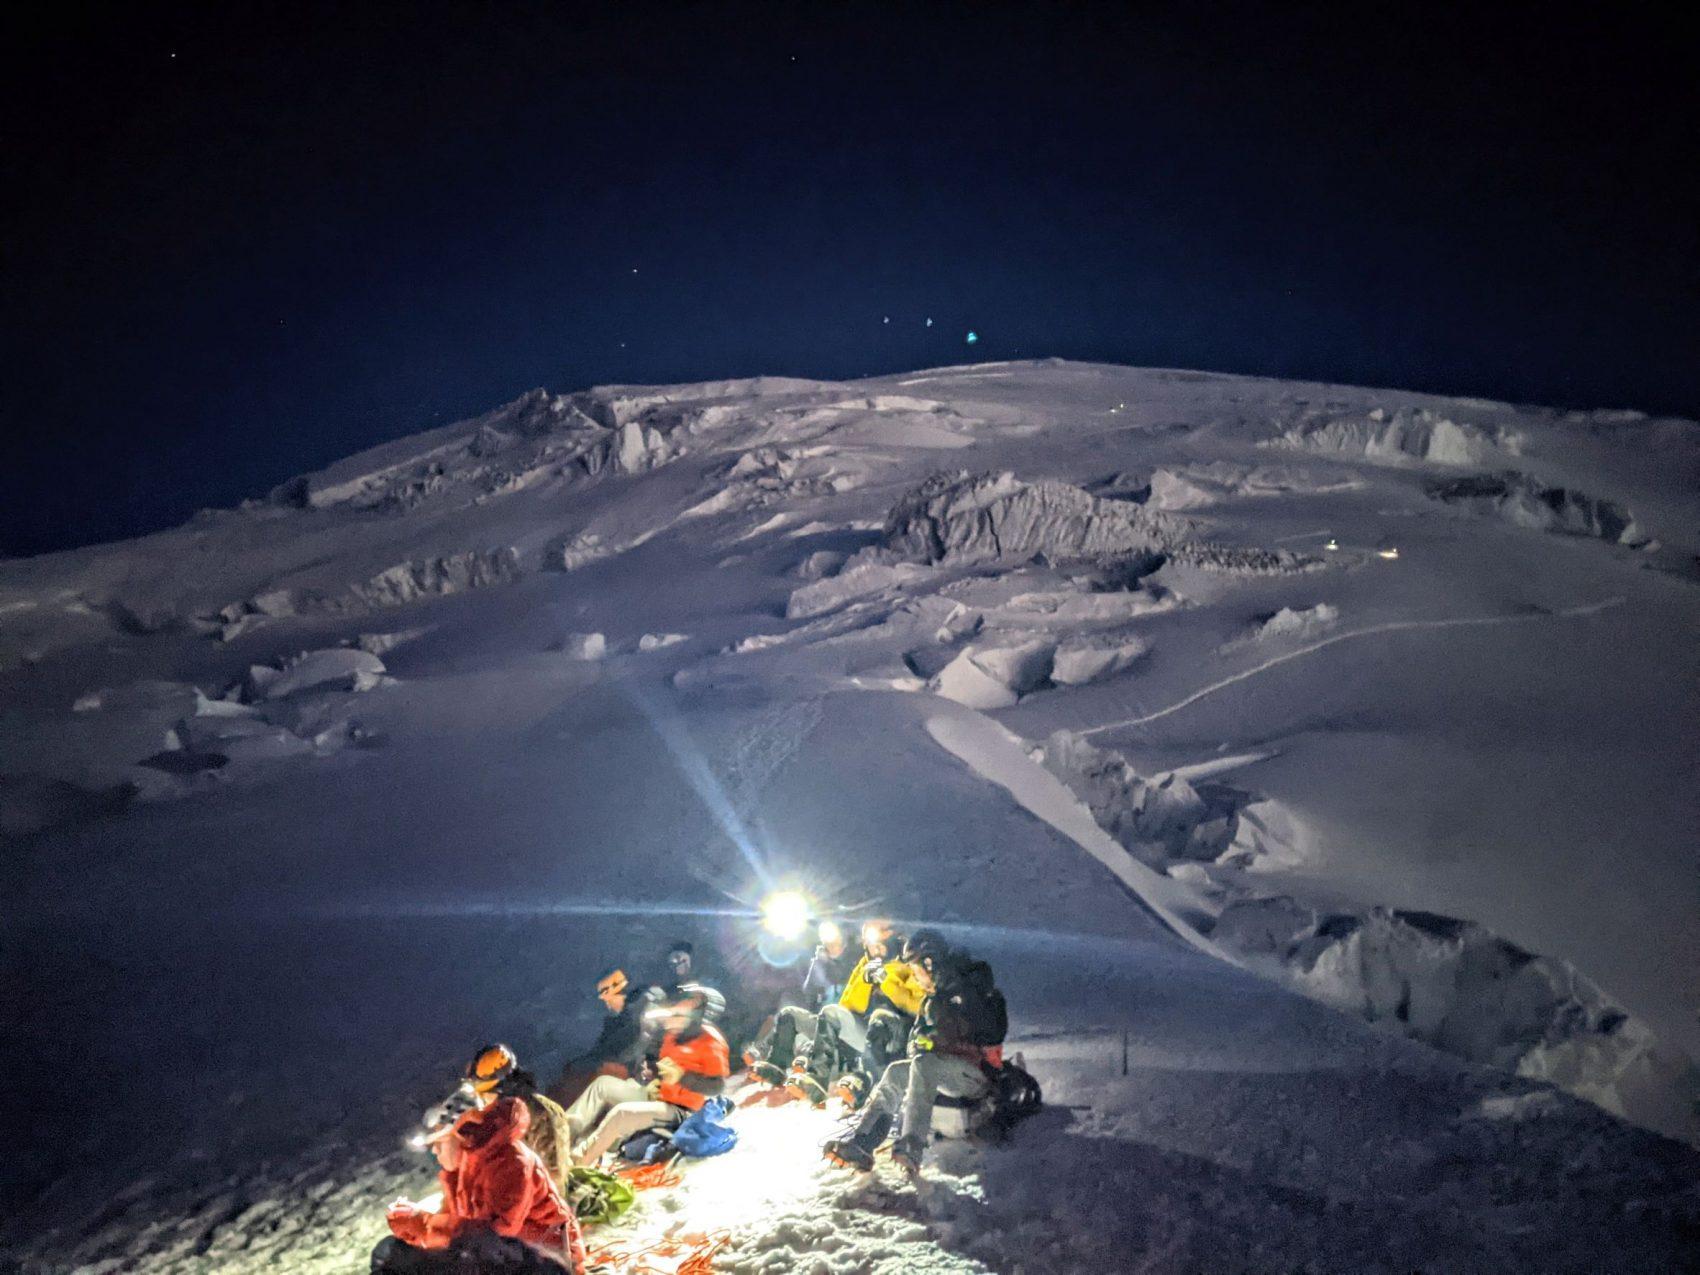 Mt. Rainier at night